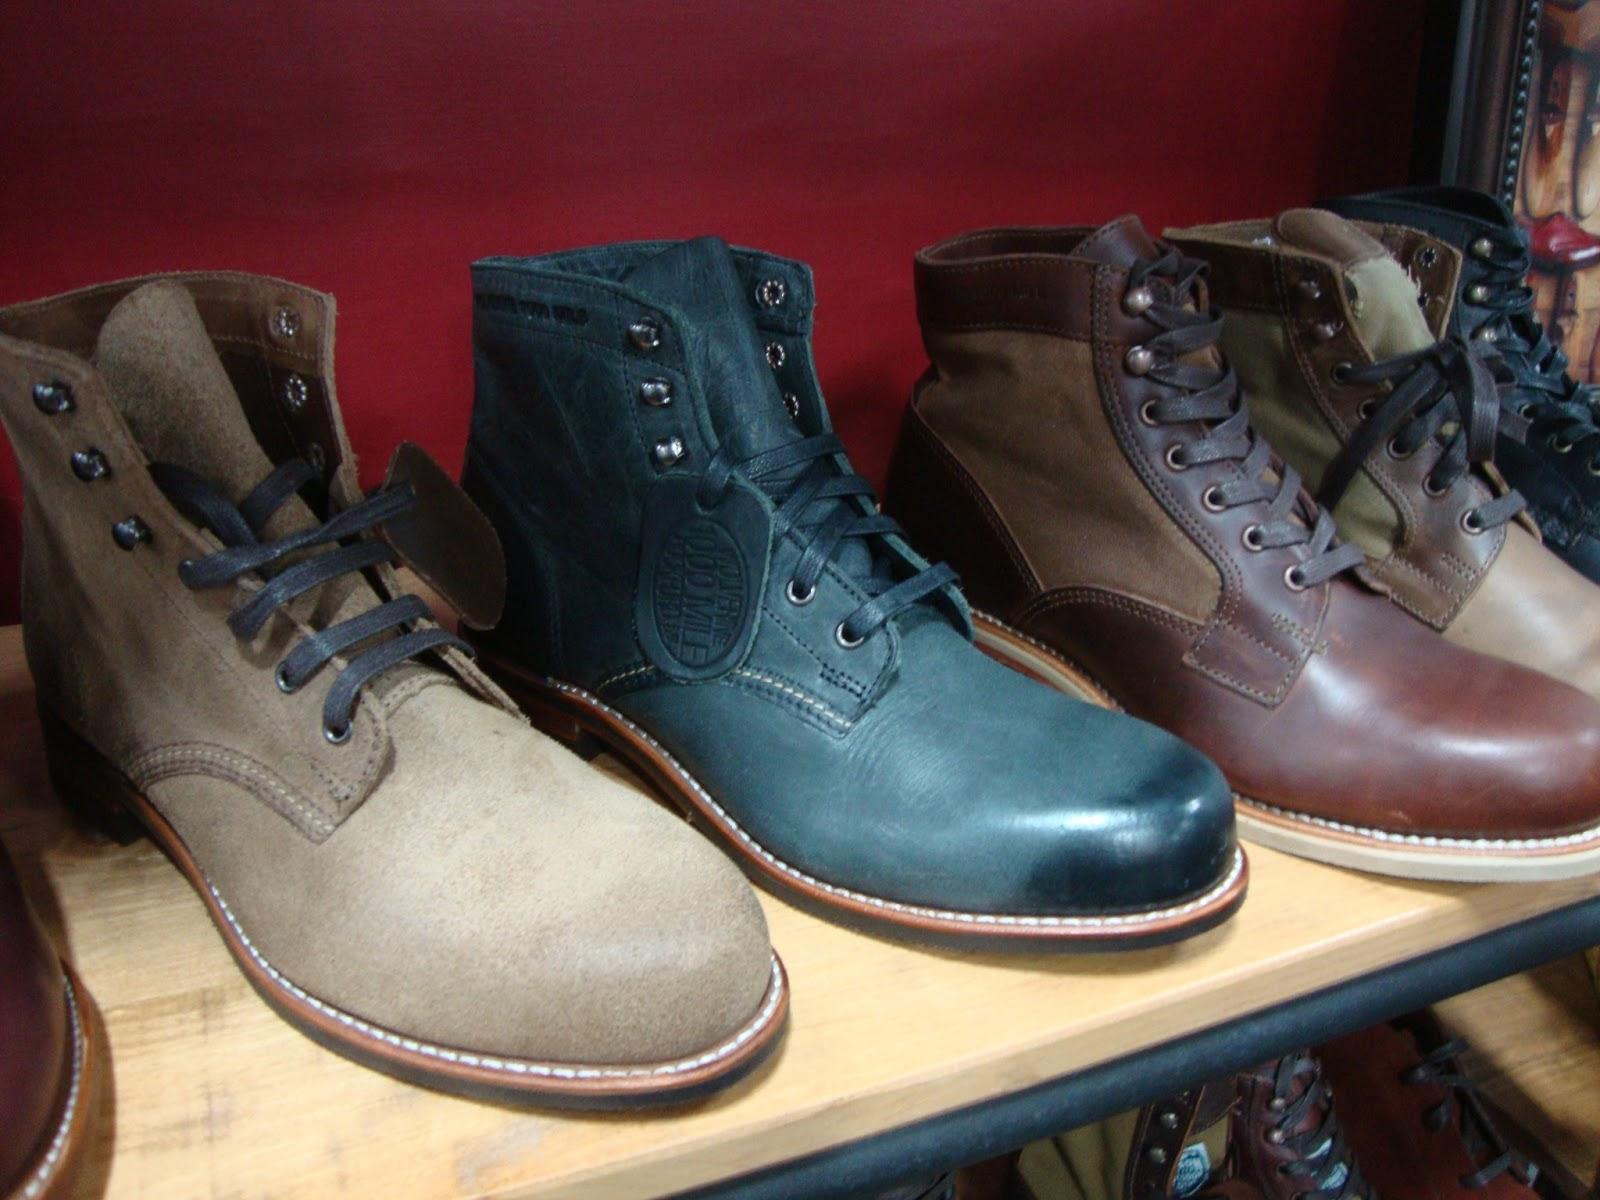 ac6c96f4454 Designer: Wolverine 1000 Mile Shoes & Accessories Fall 2013 ...